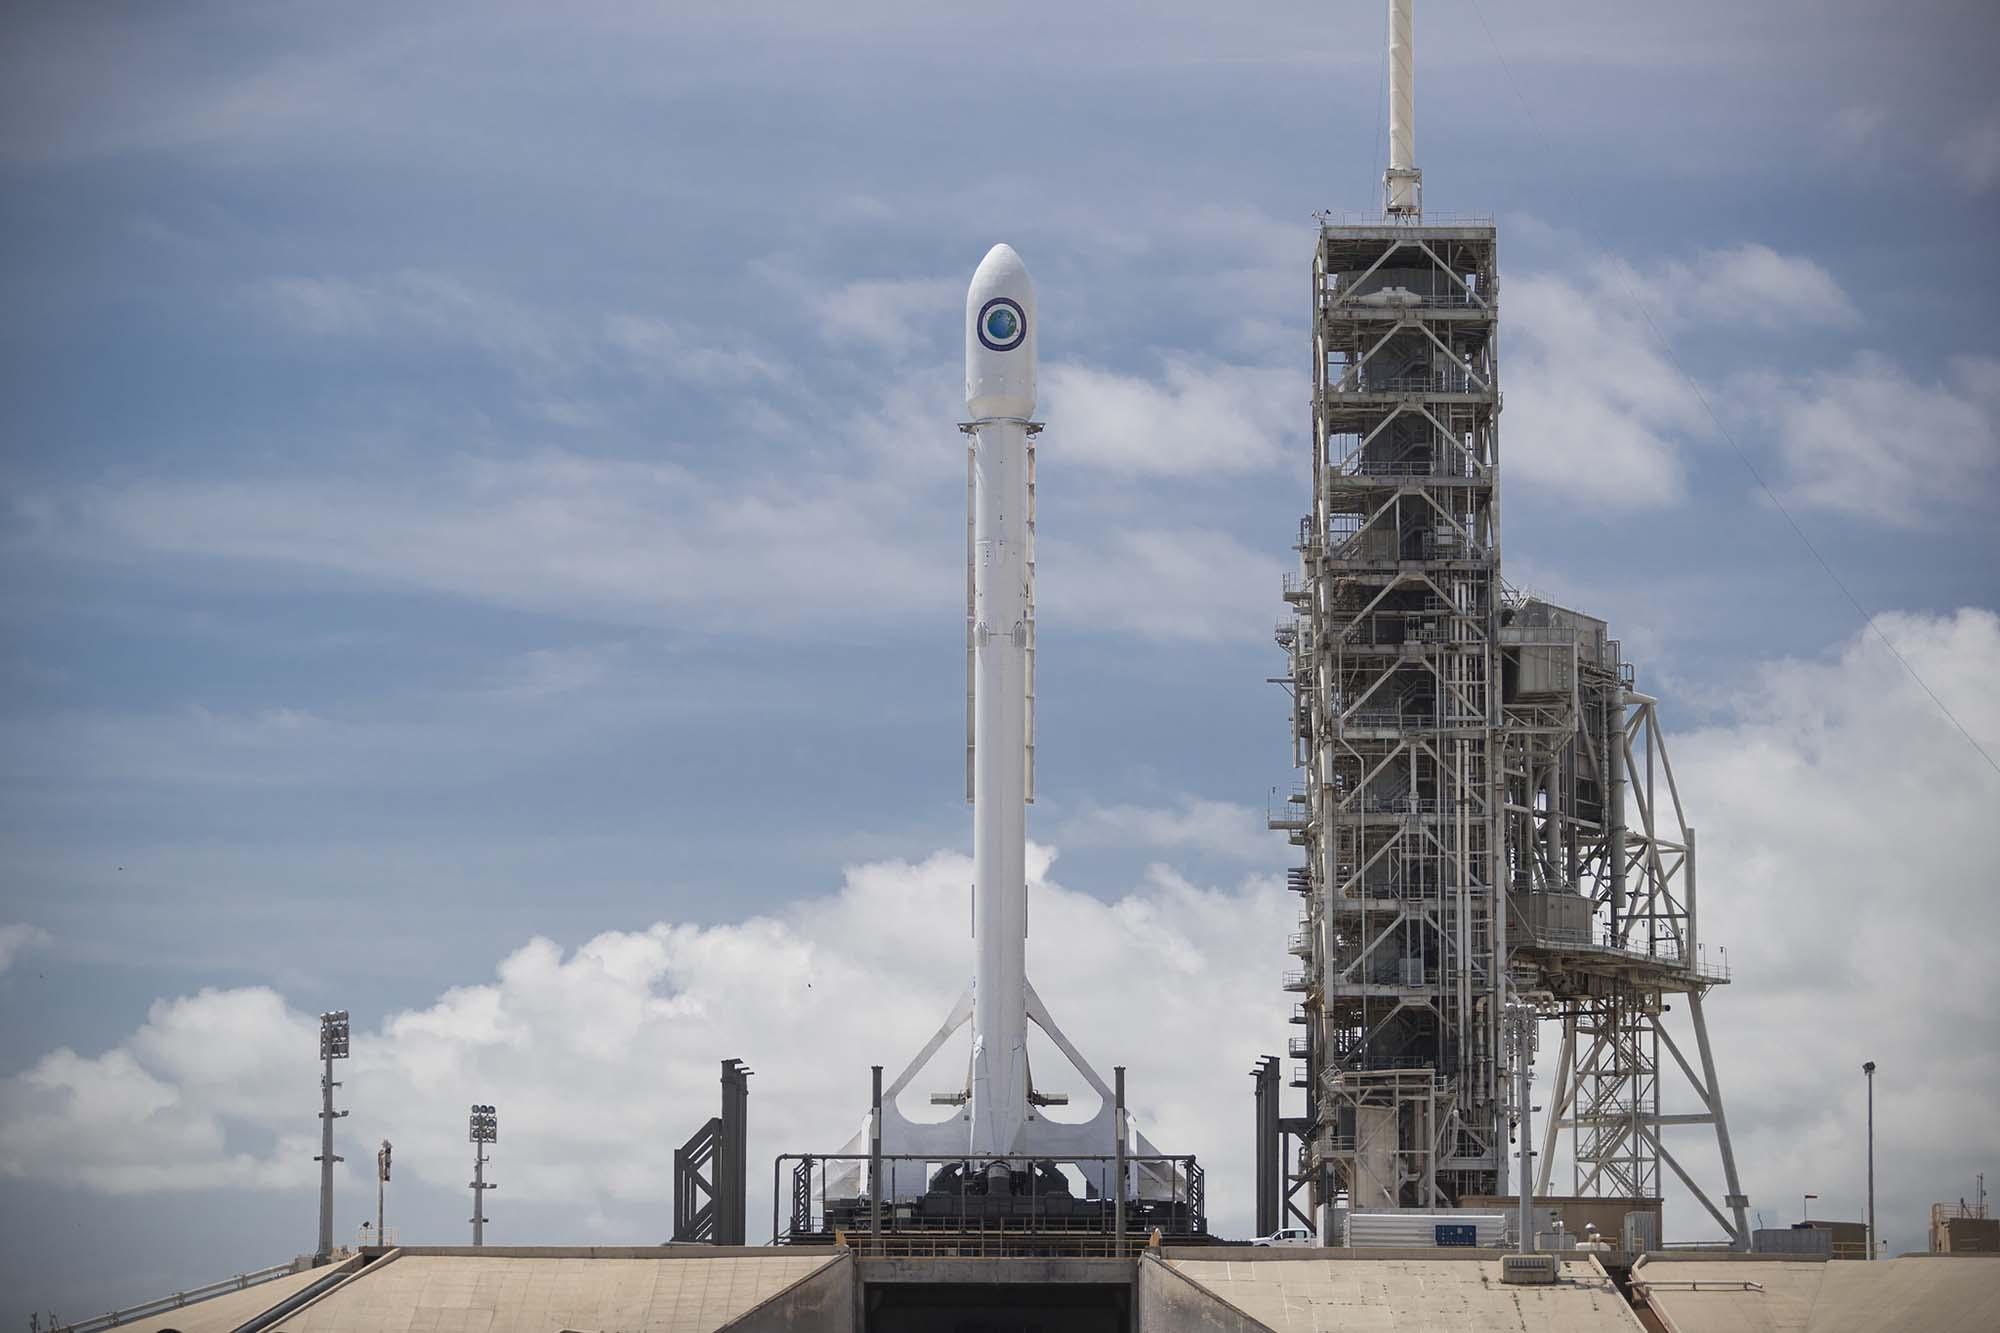 SpaceX veut lancer son premier satellite Internet en 2019